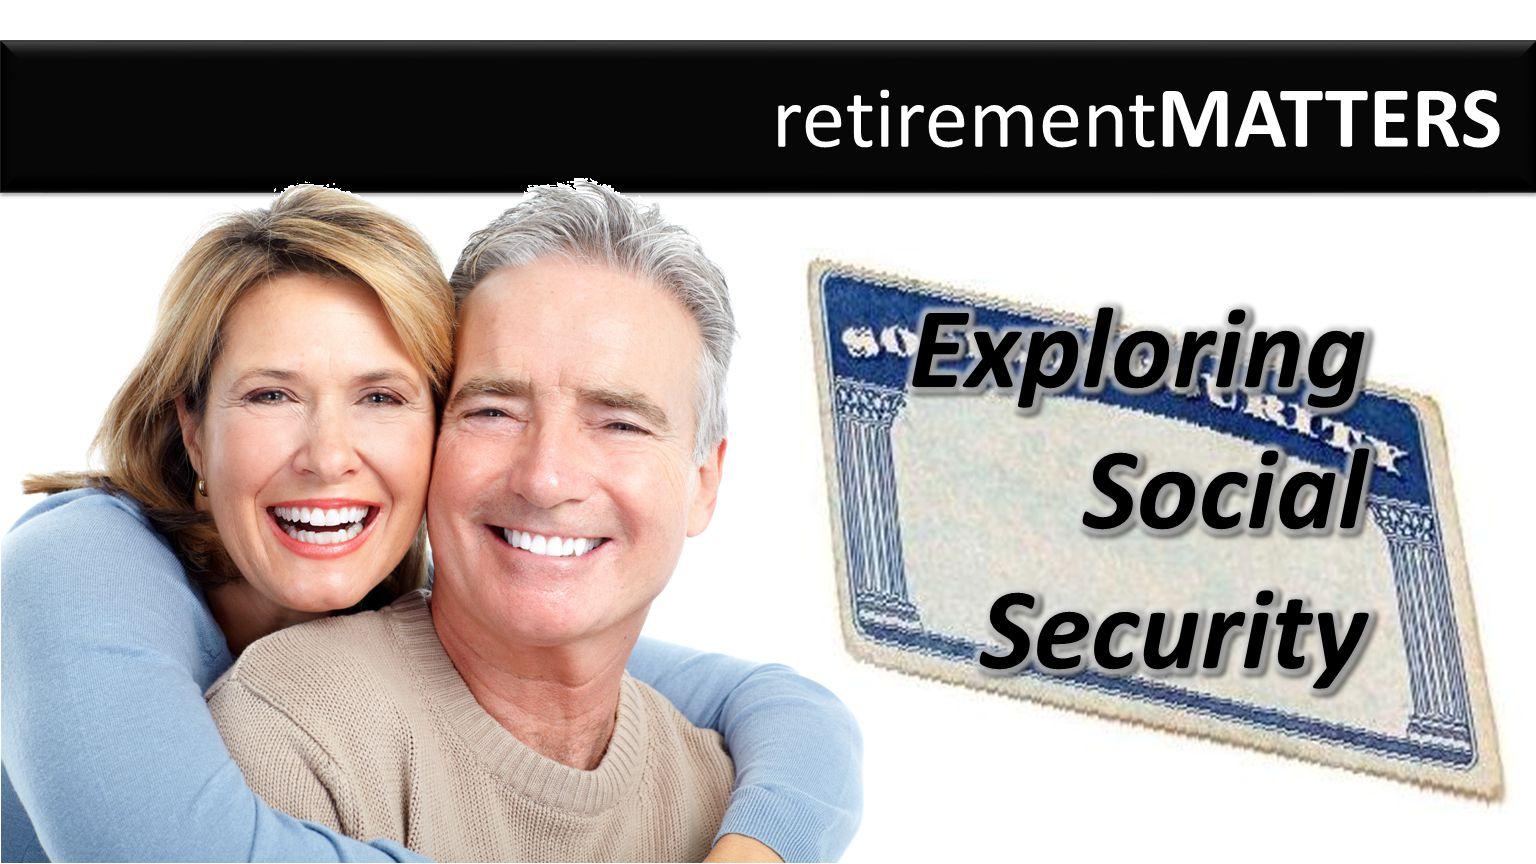 retirementMATTERS